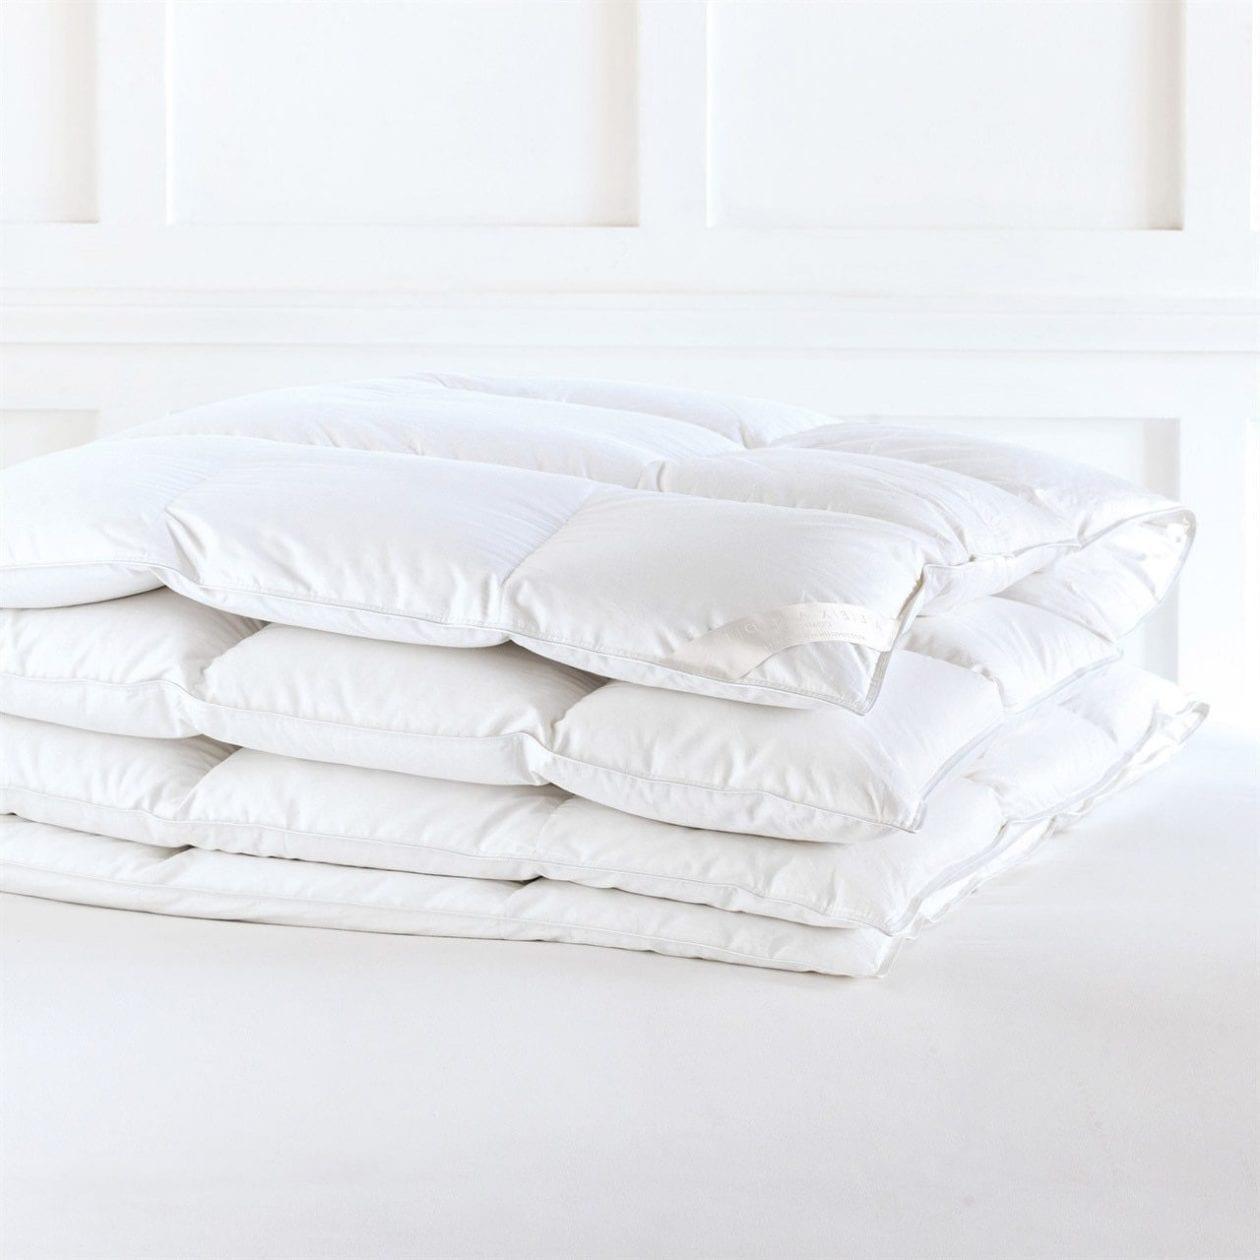 white folded down comforter on white background